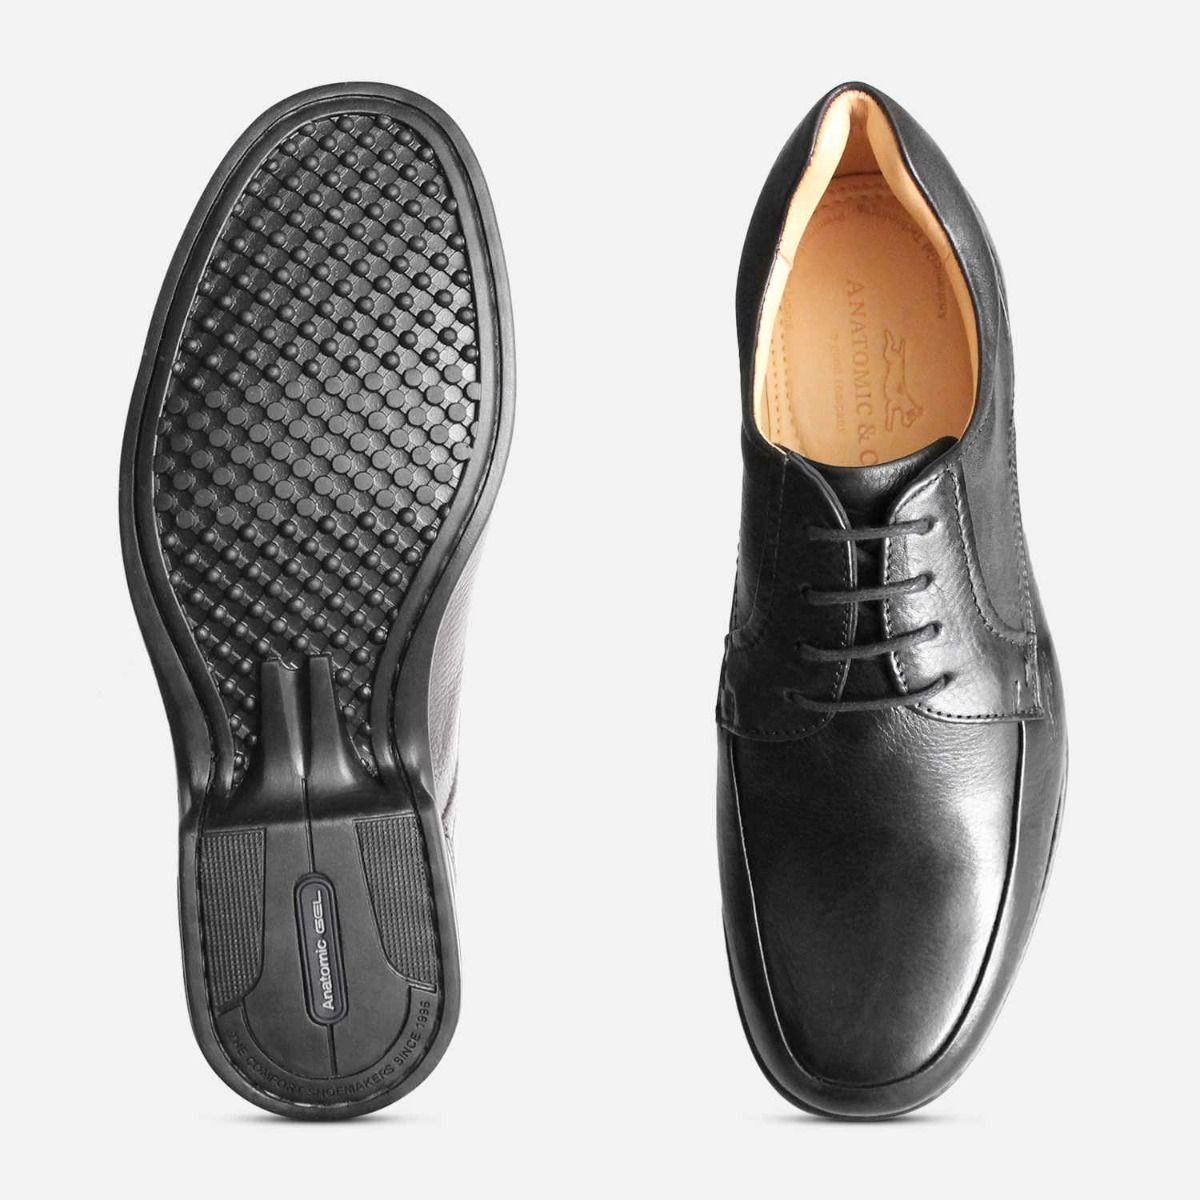 Co Formal Black Leather Mens Comfort Shoes